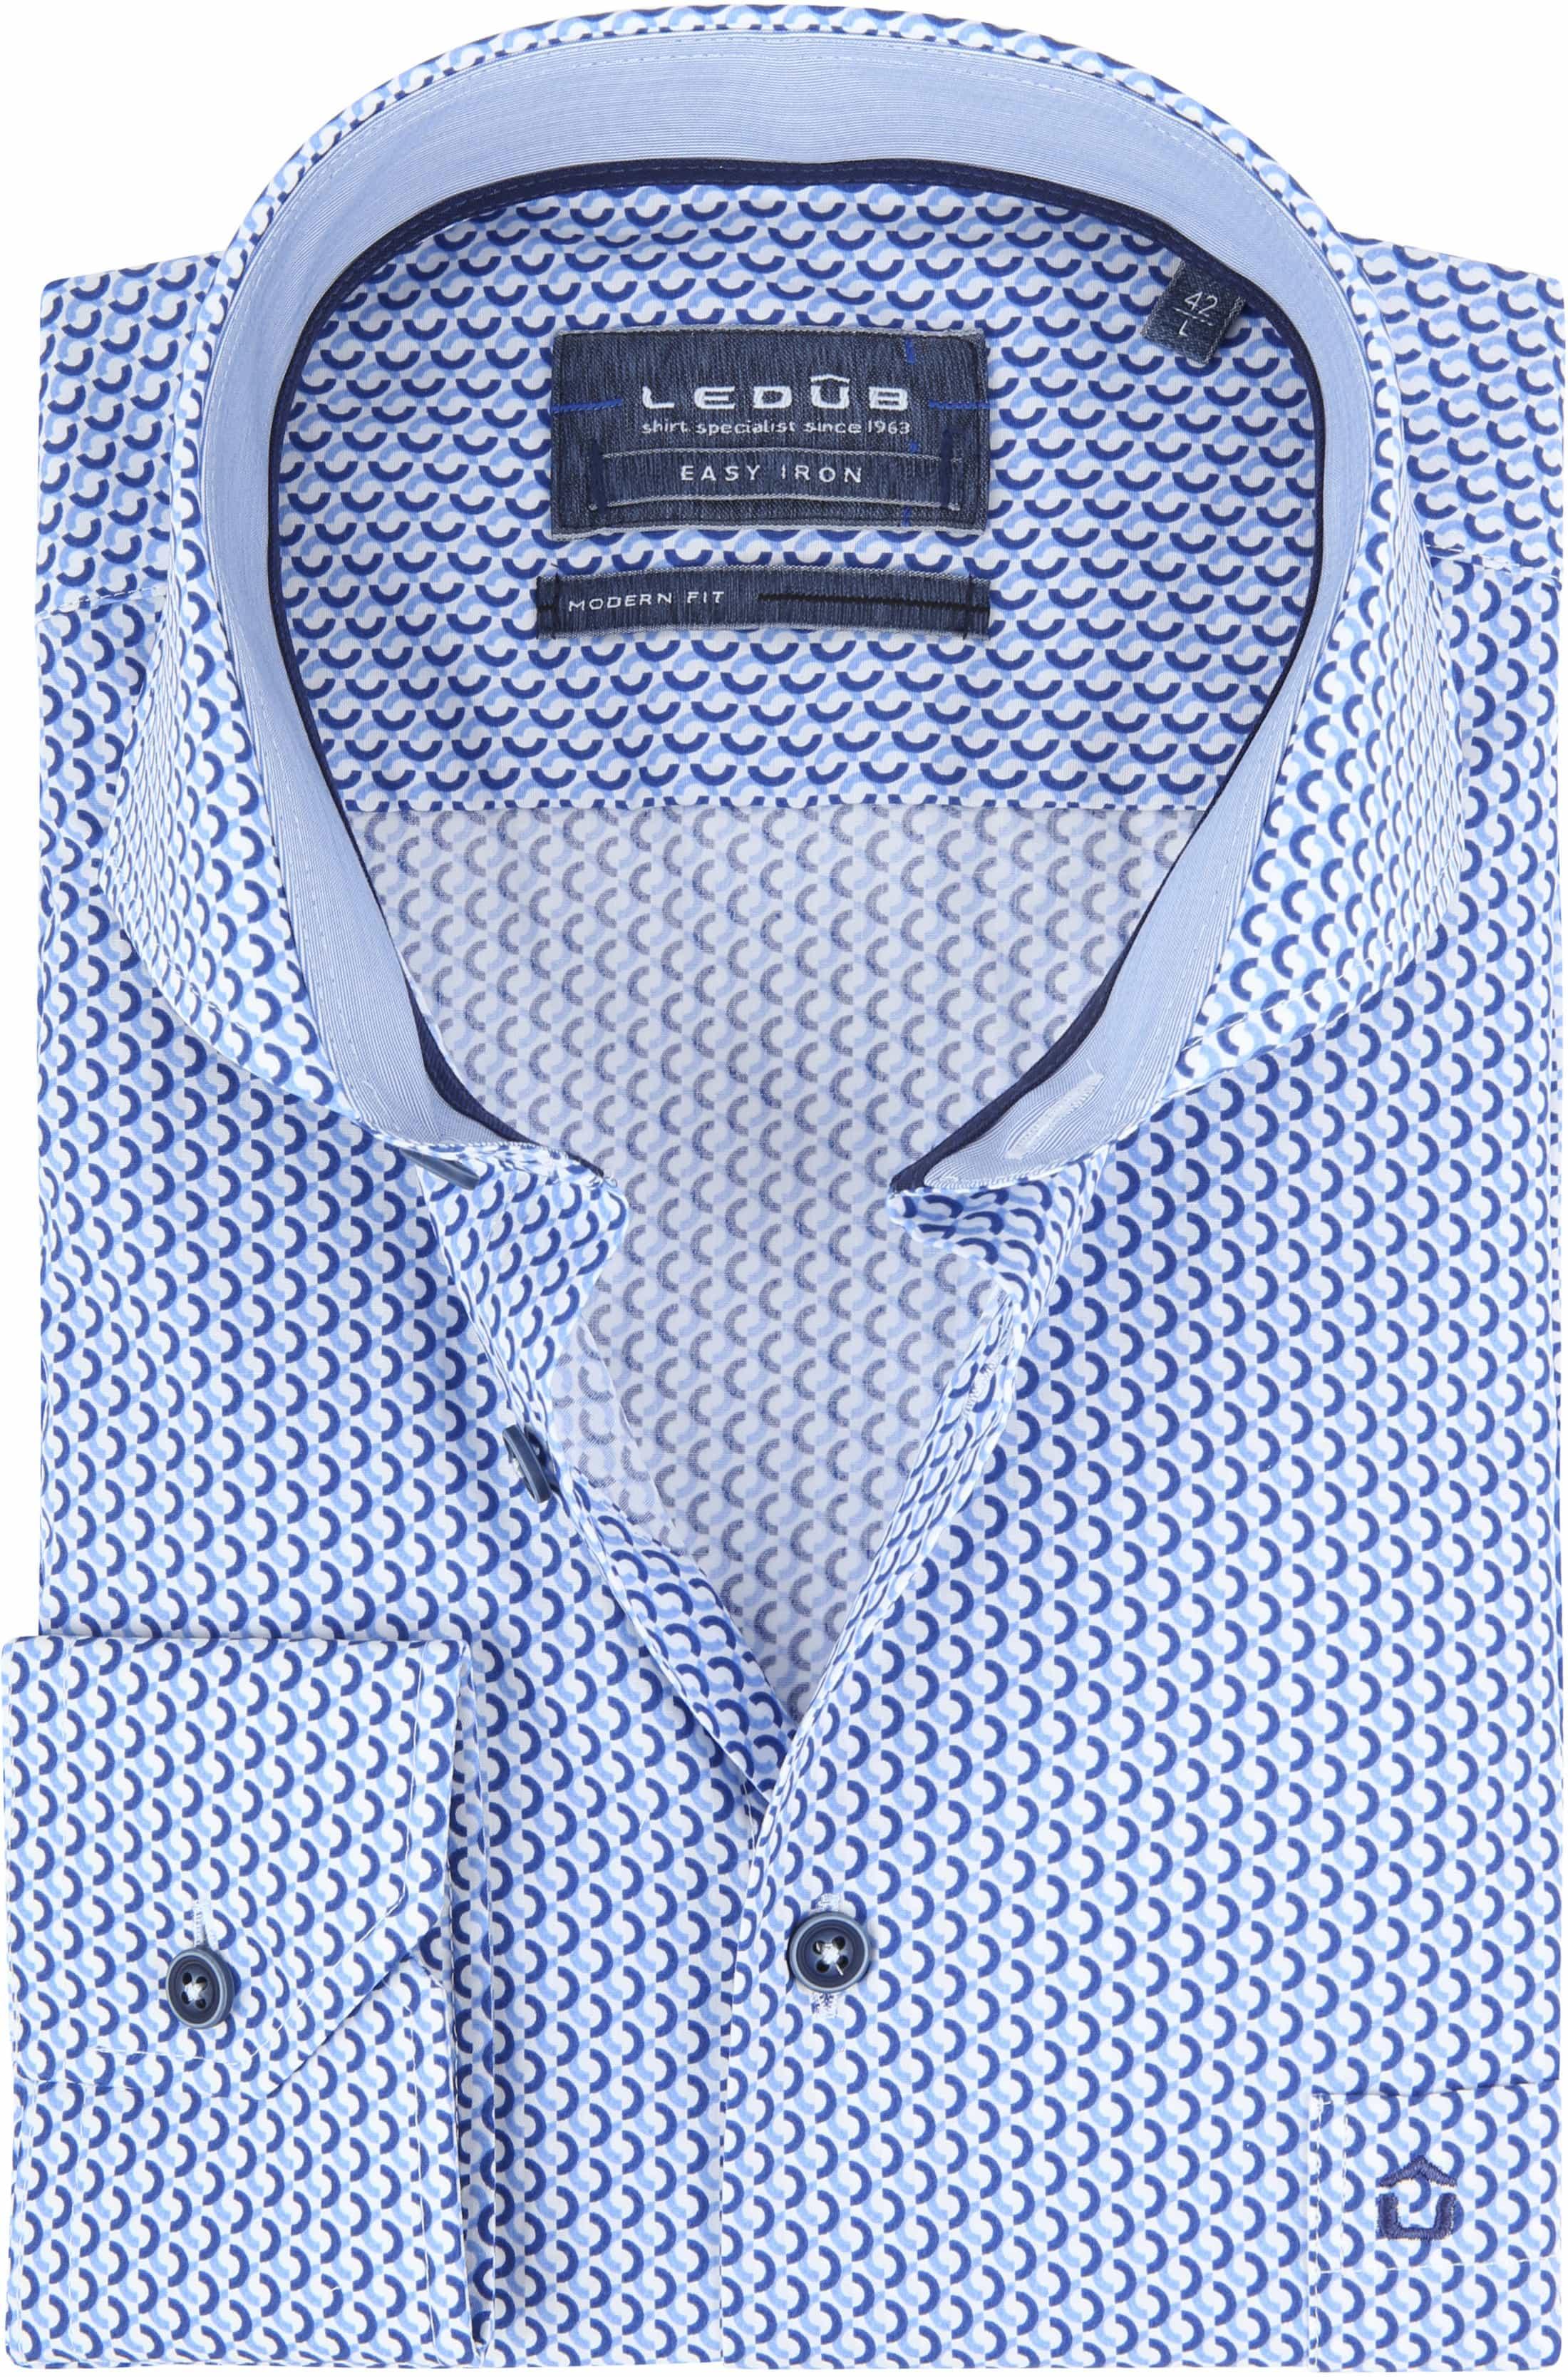 Ledub Overhemd Blauw Patroon foto 0